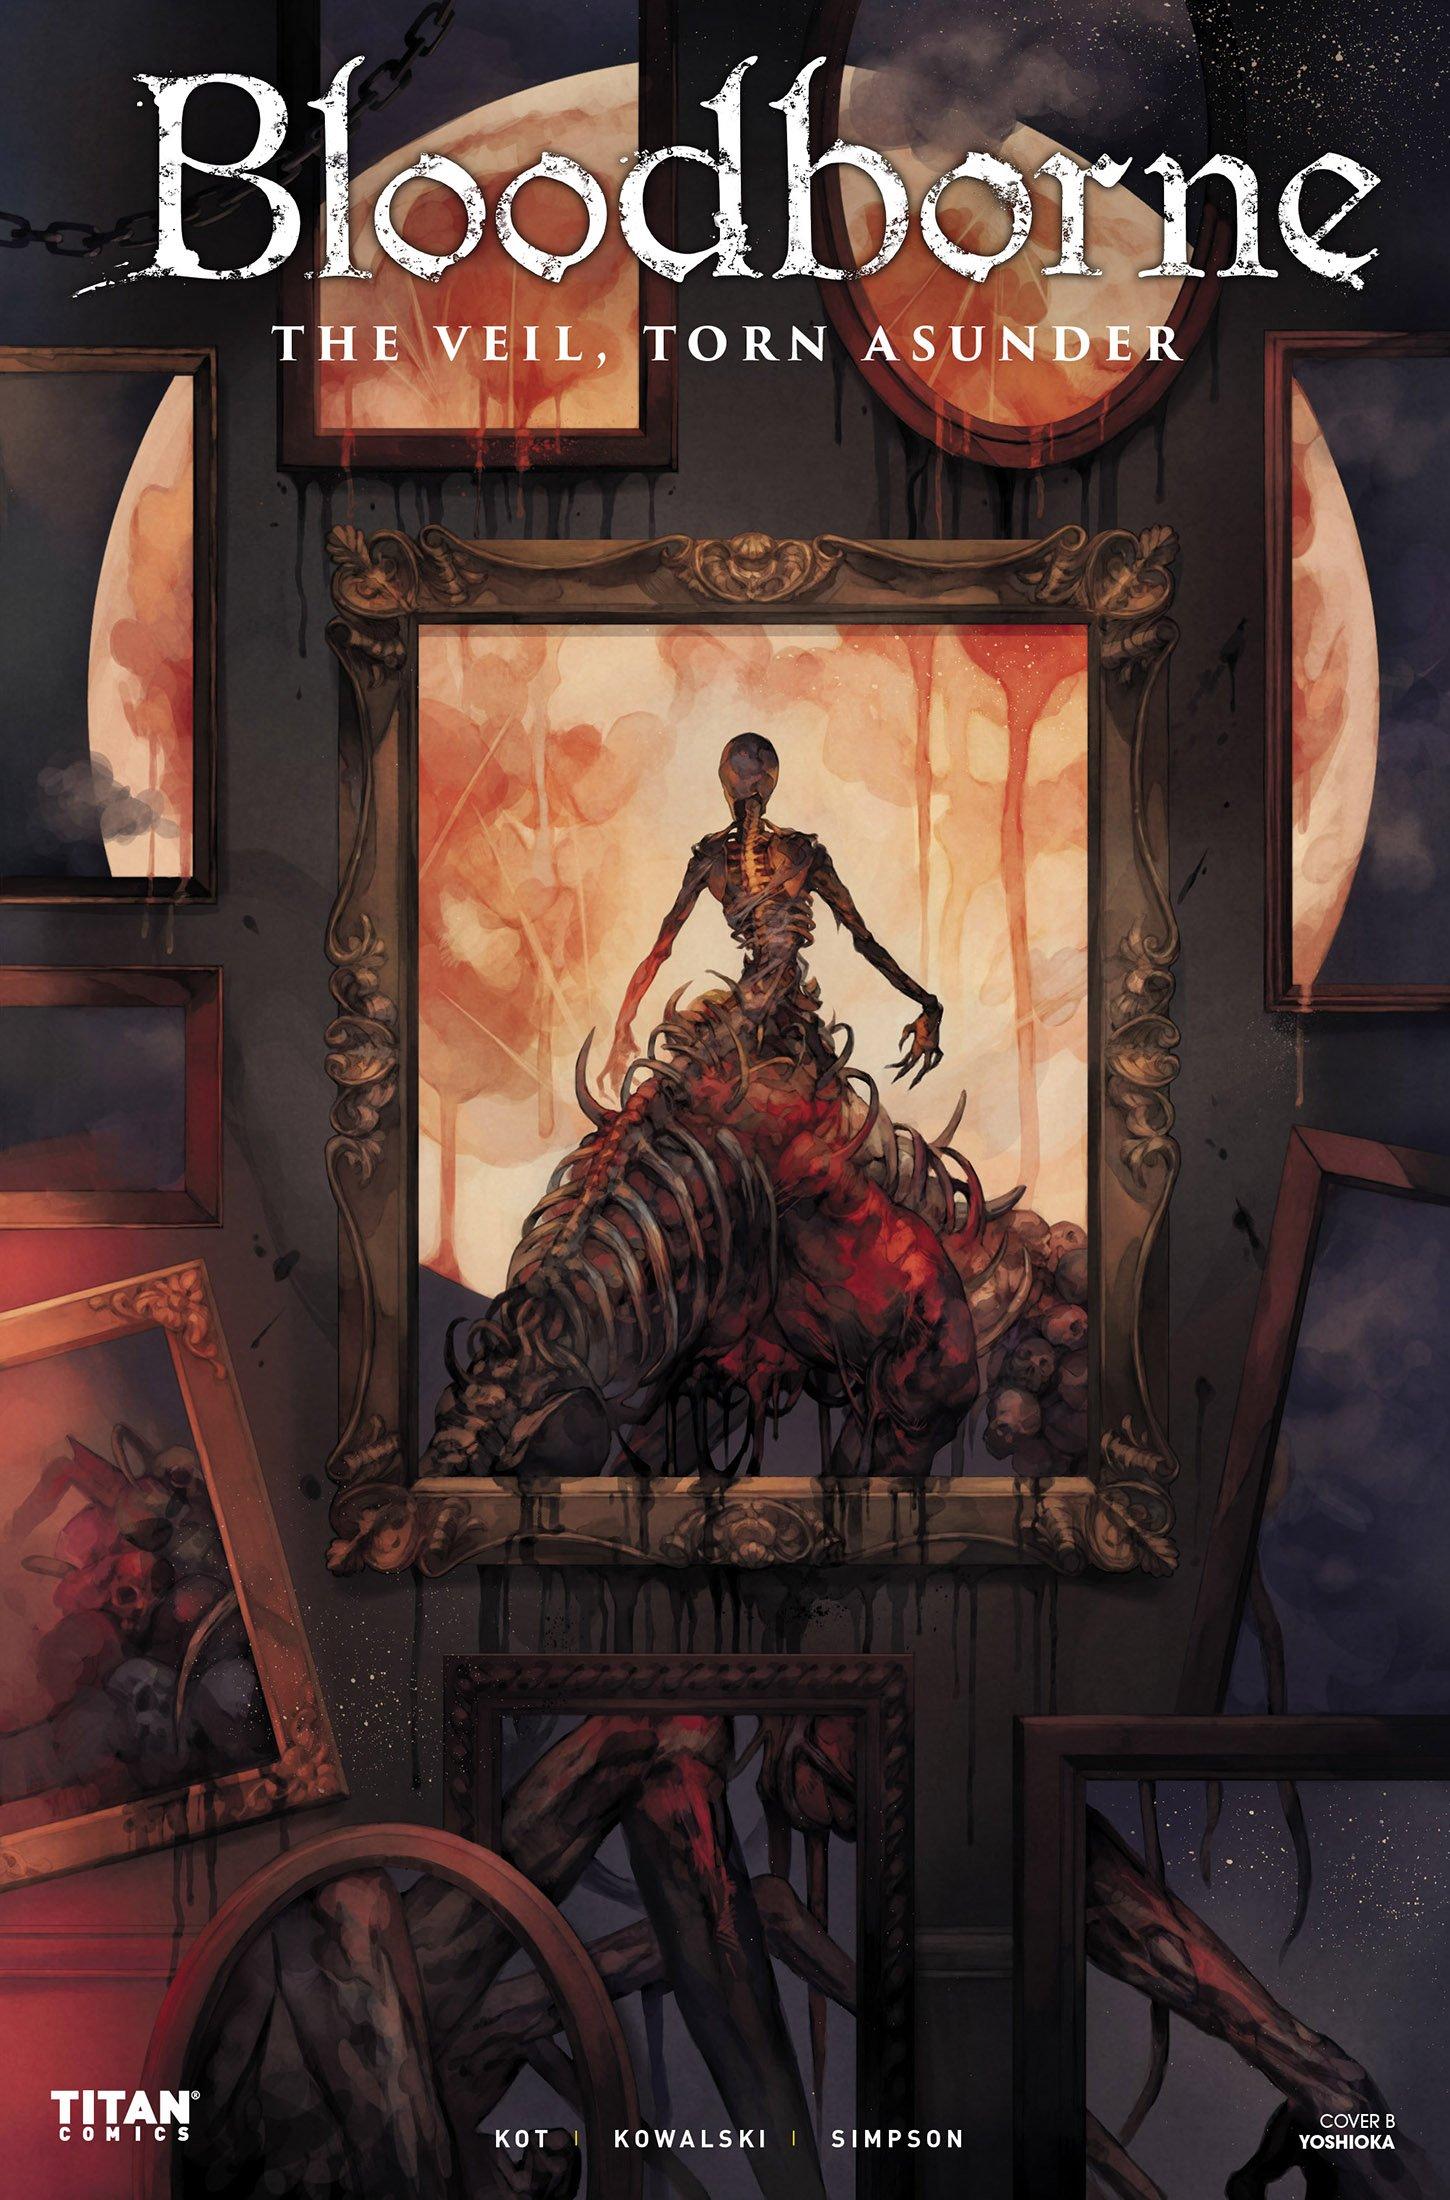 Bloodborne 015 (October 2019) (cover b)